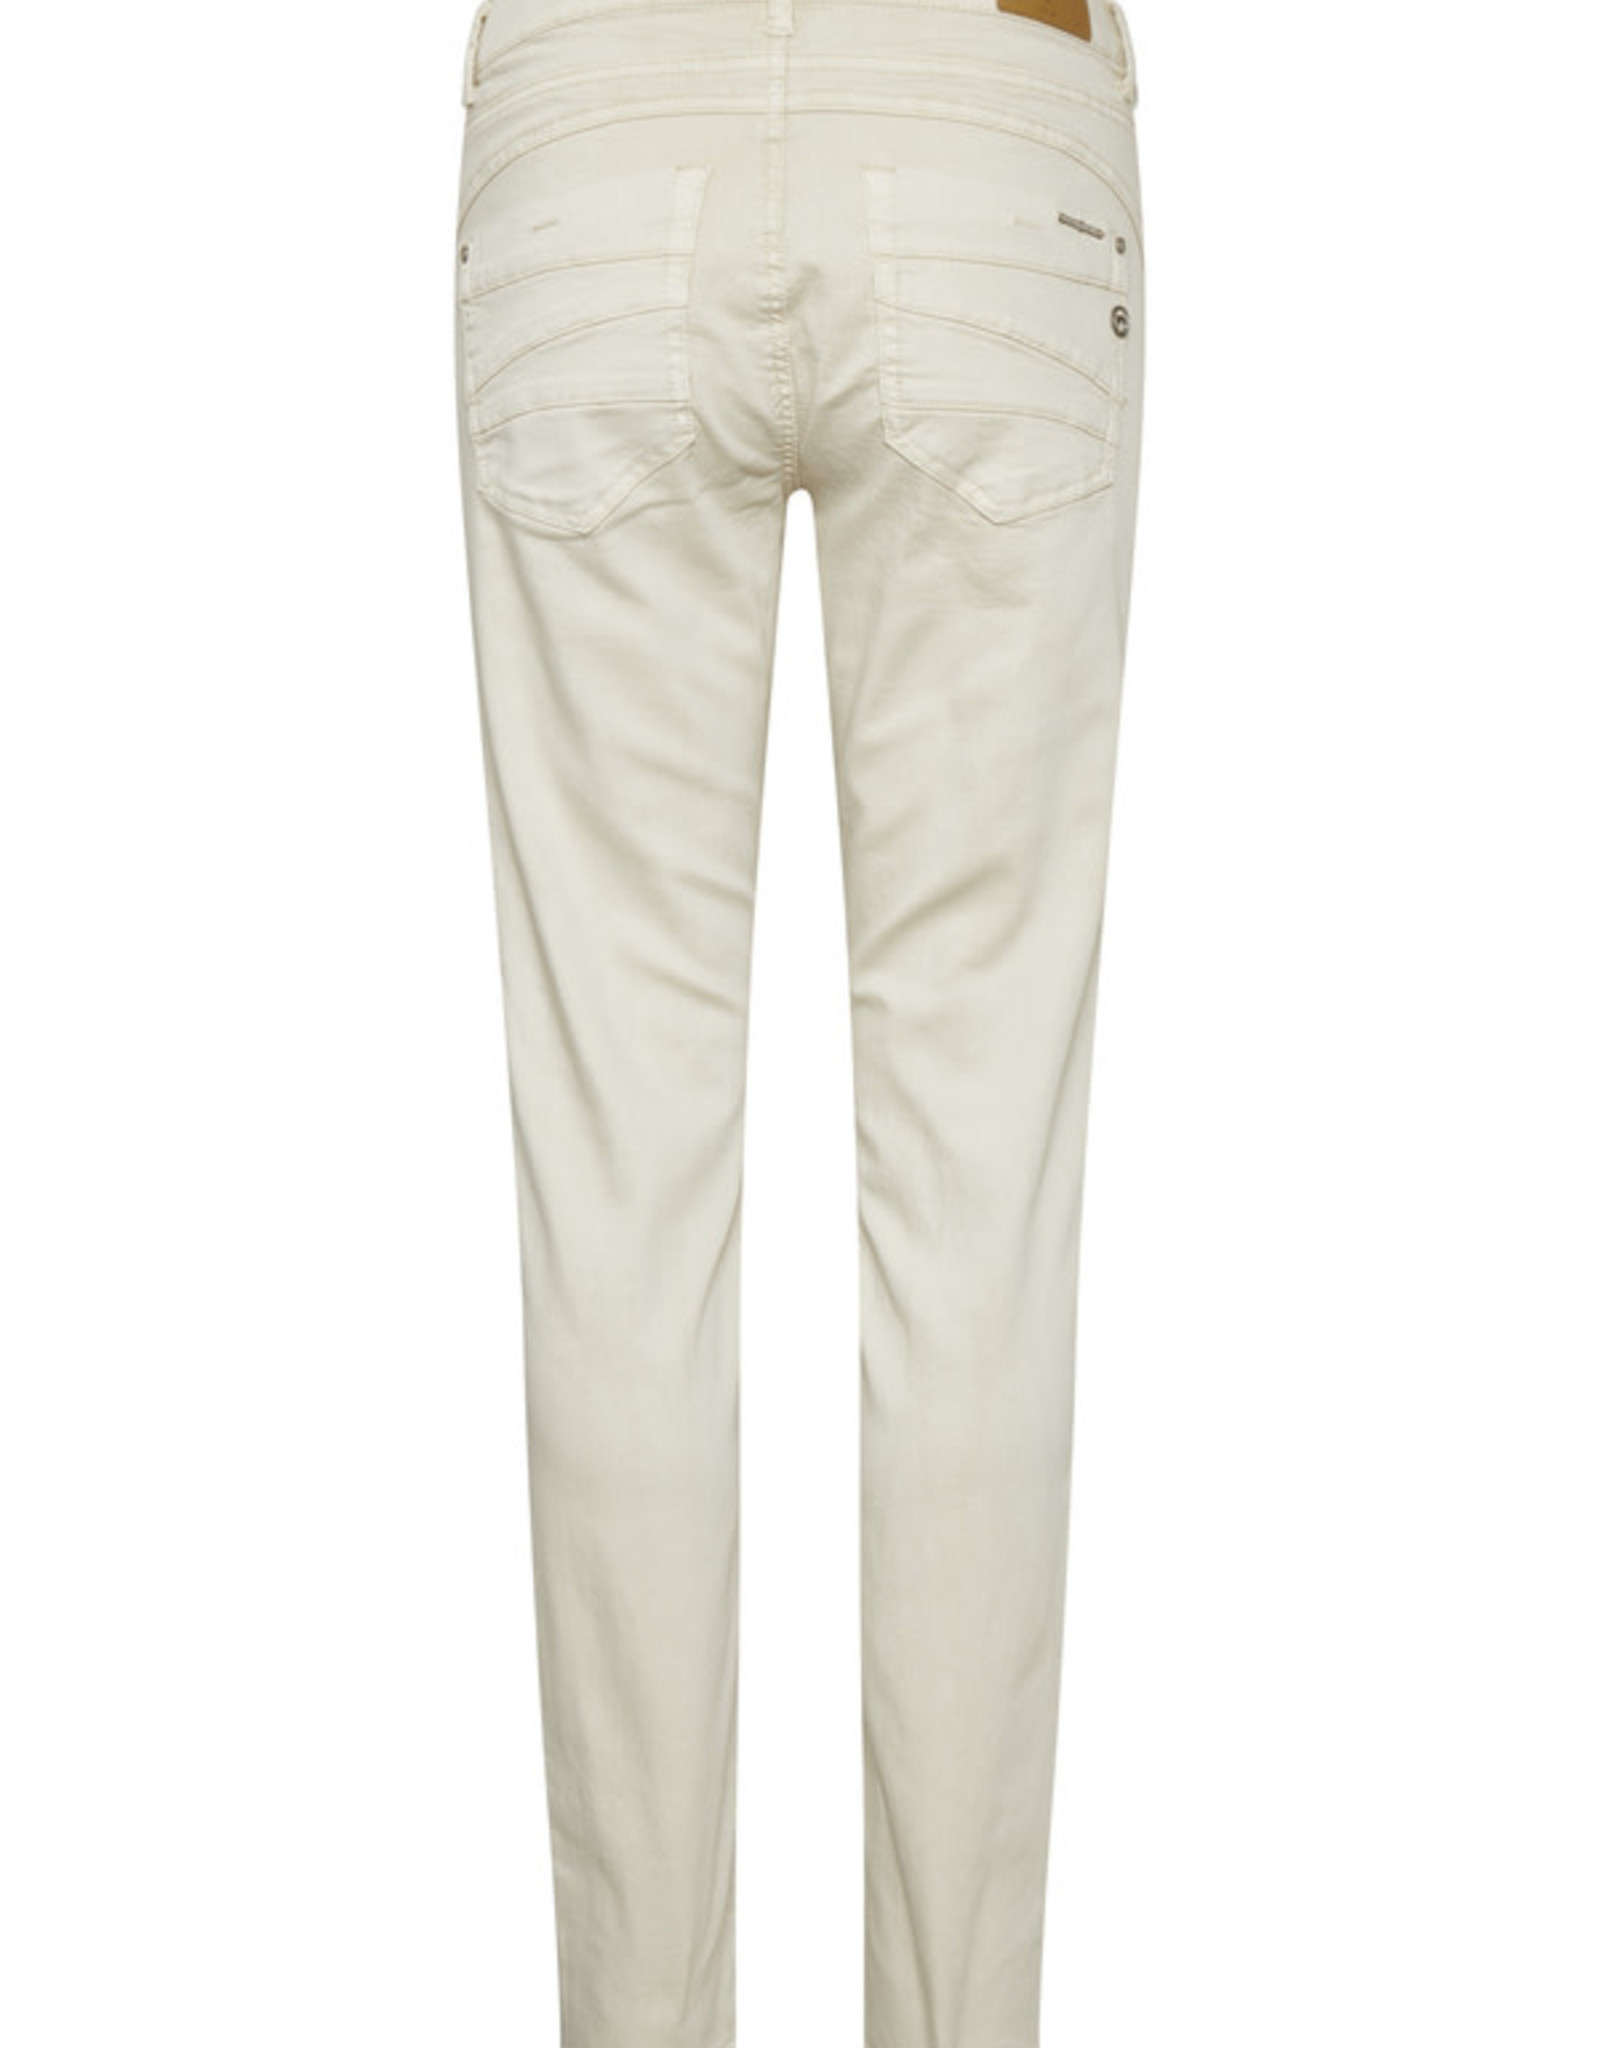 Cream Cream- Lottecr plain twill pant